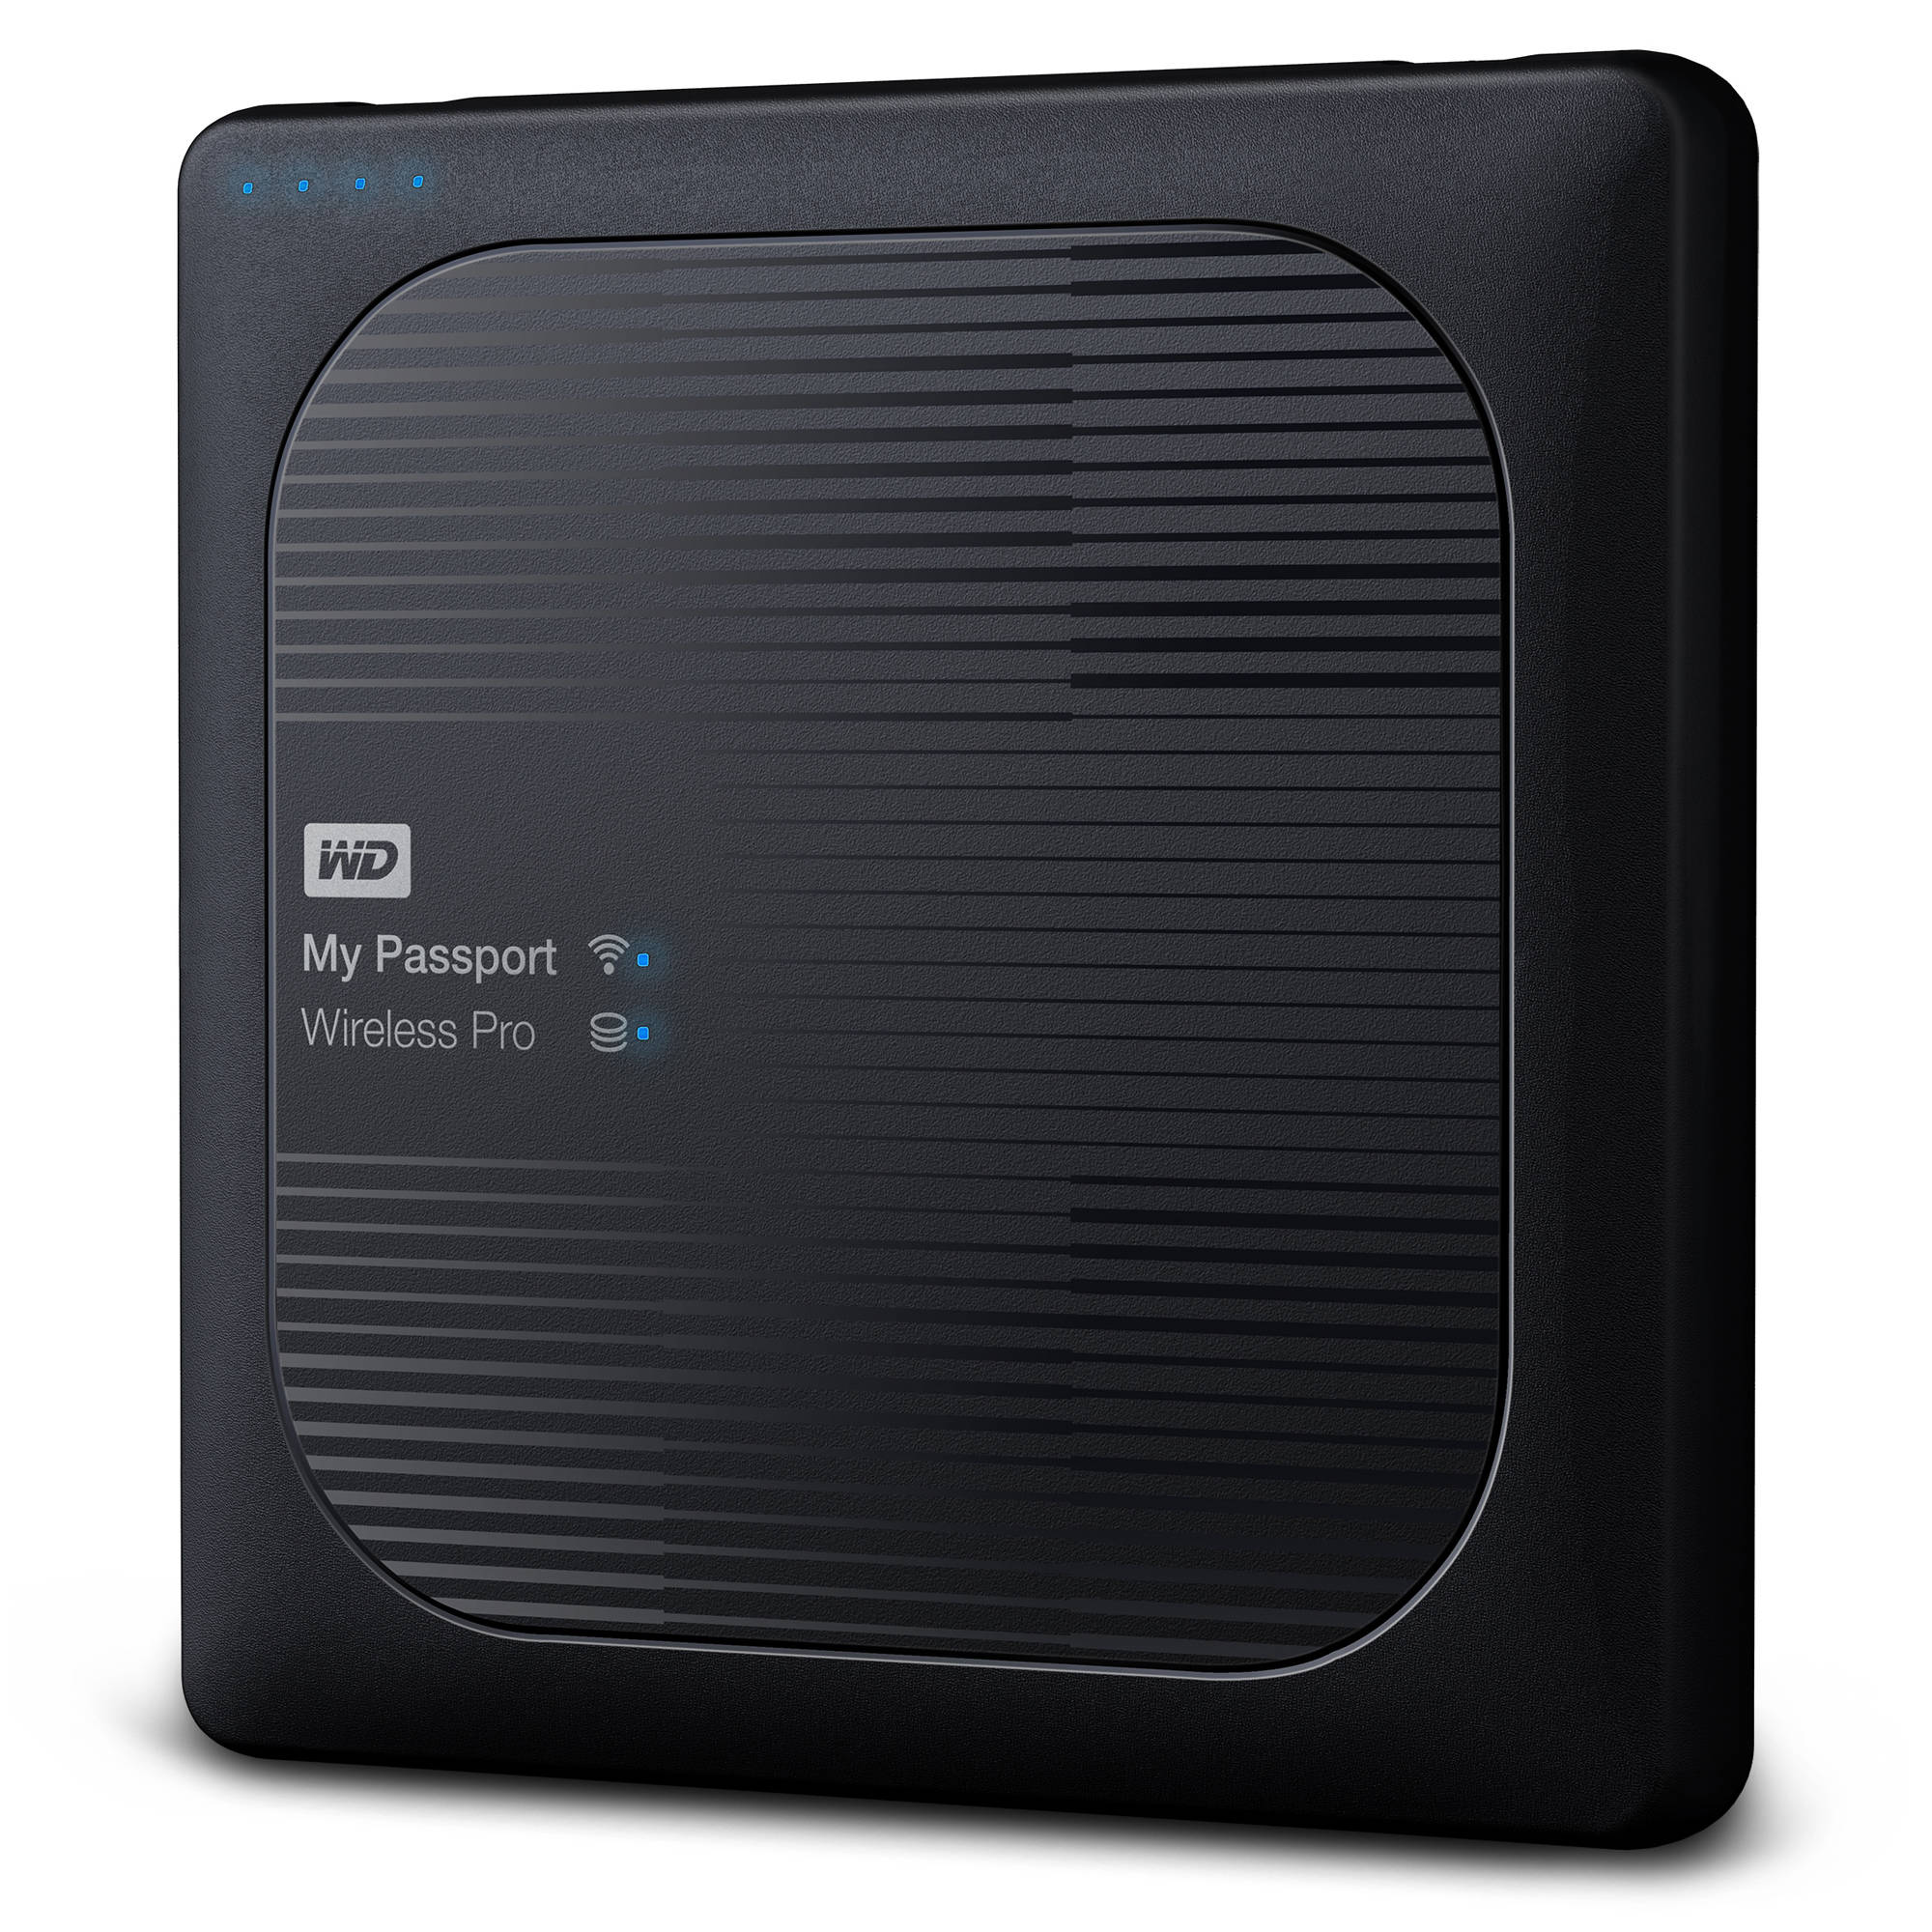 Wd 3tb My Passport Wireless Pro Usb 3 0 Wdbsmt0030bbk Nesn B H